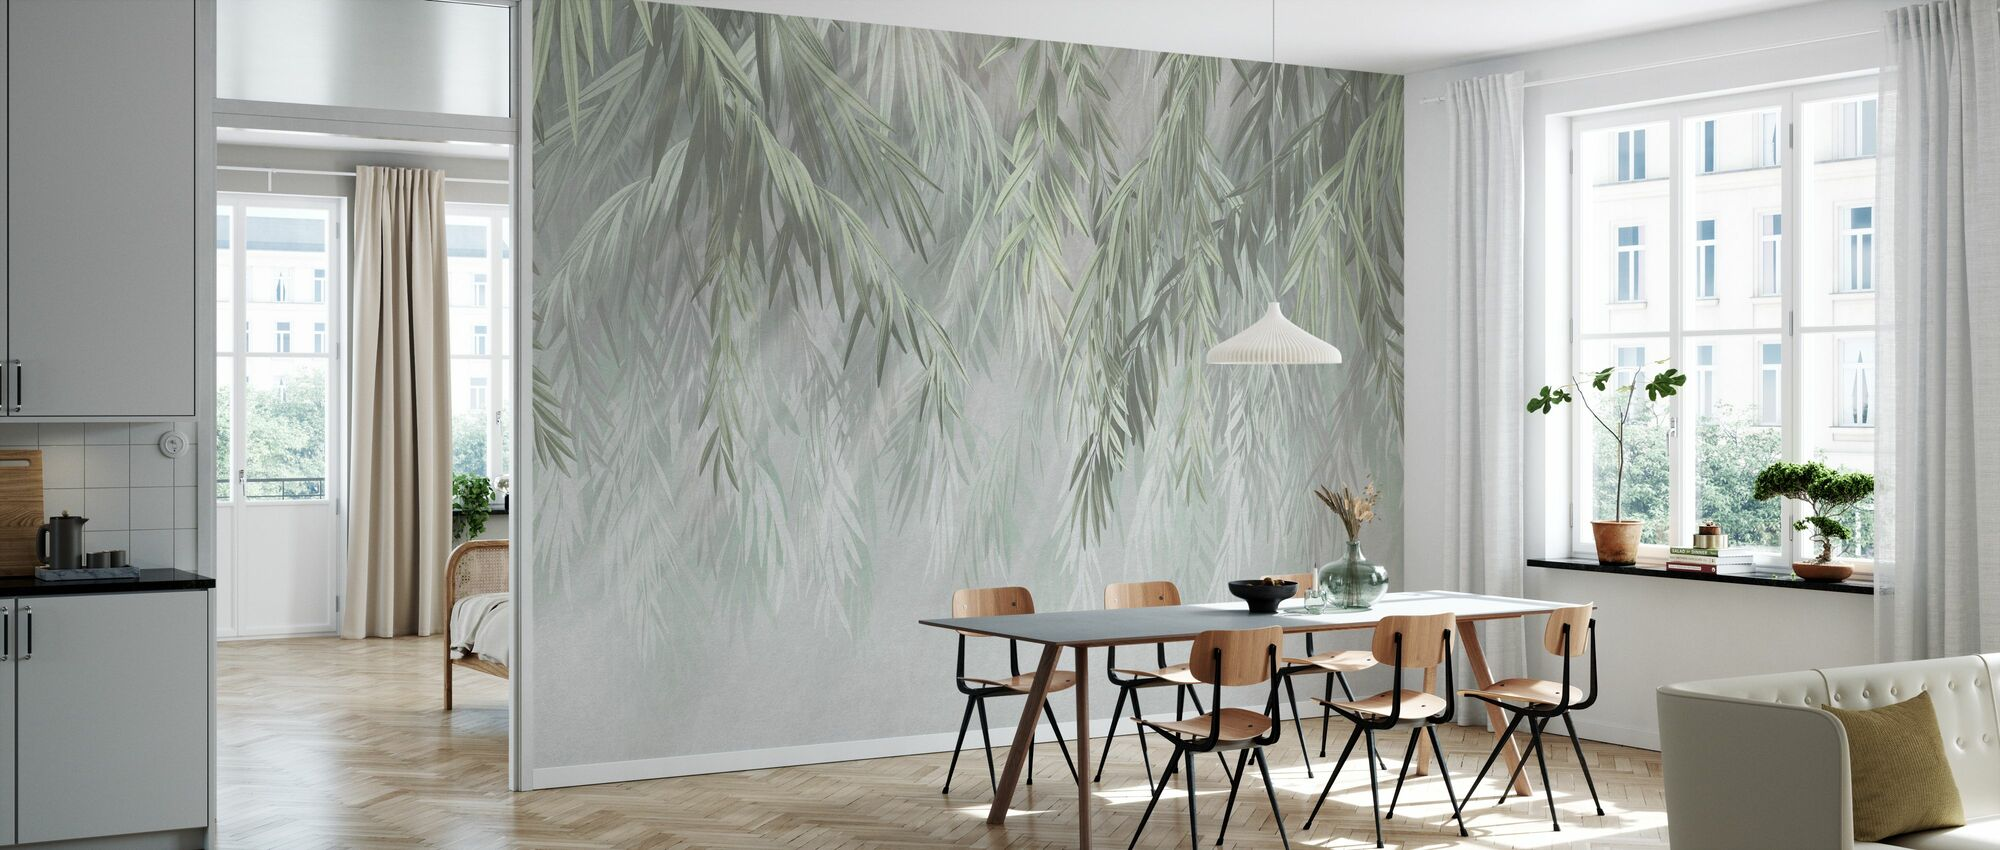 Tropical Gleam IIII - Wallpaper - Kitchen